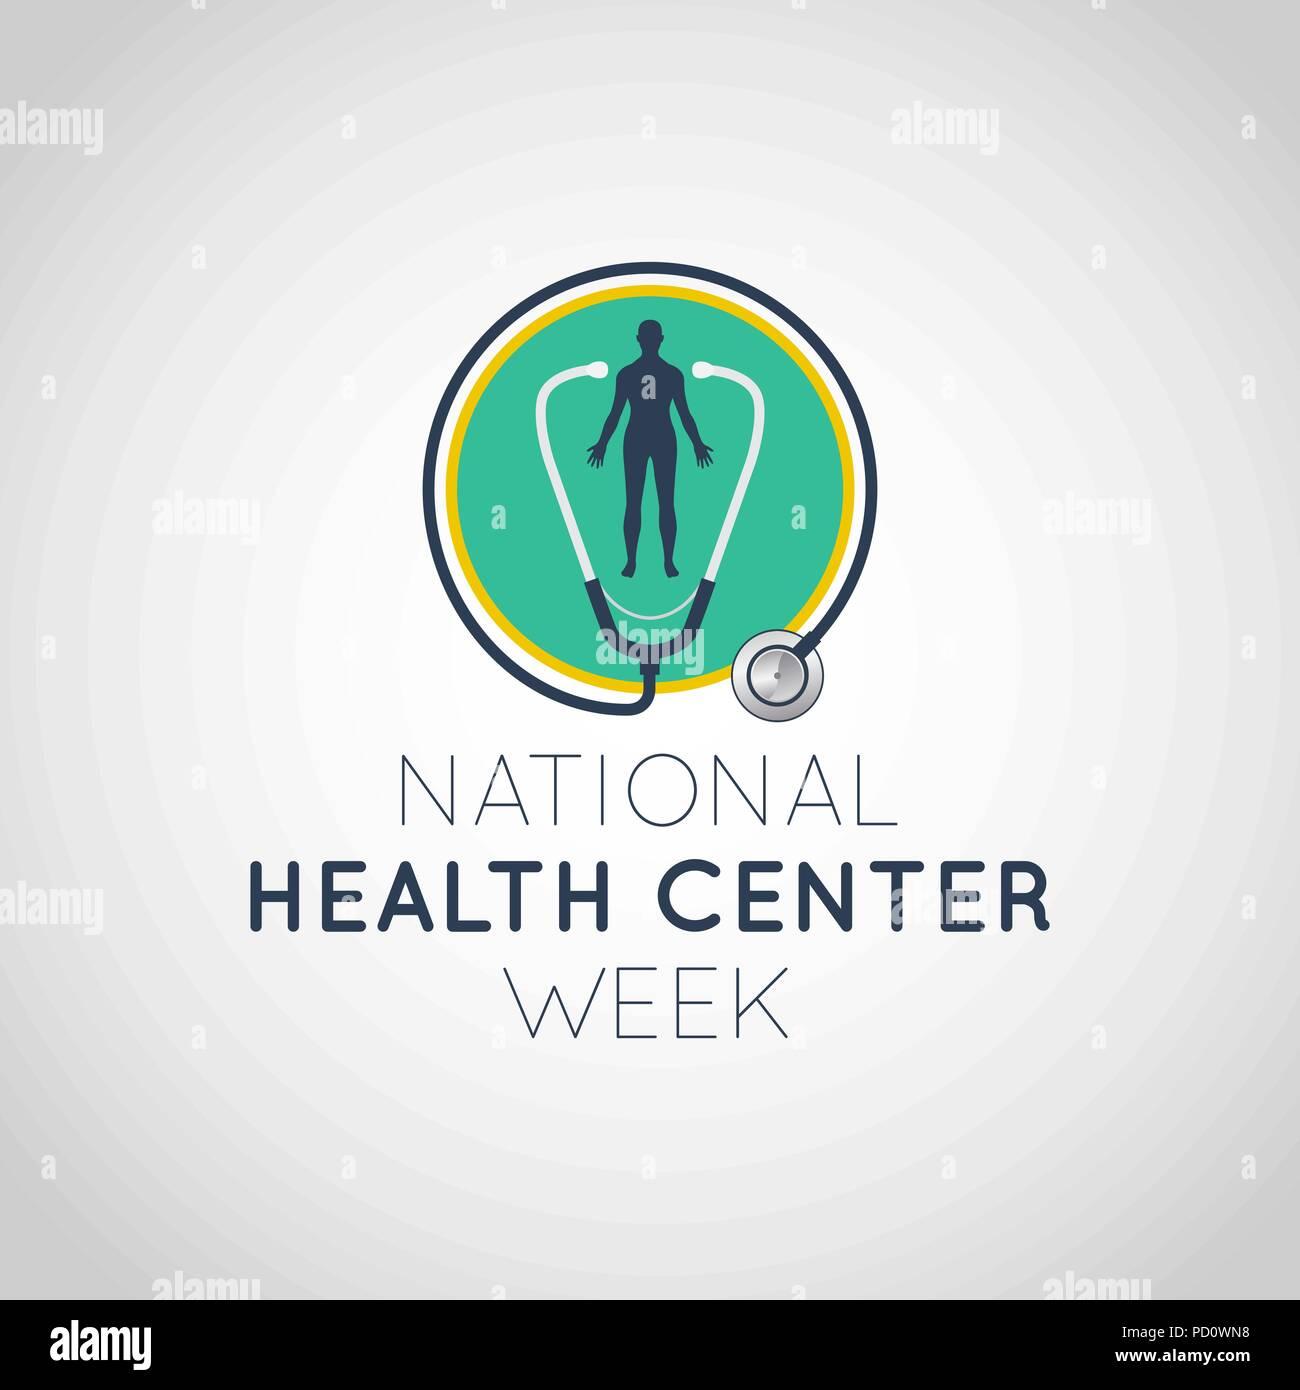 National Health Center Week vector logo icon illustration - Stock Vector